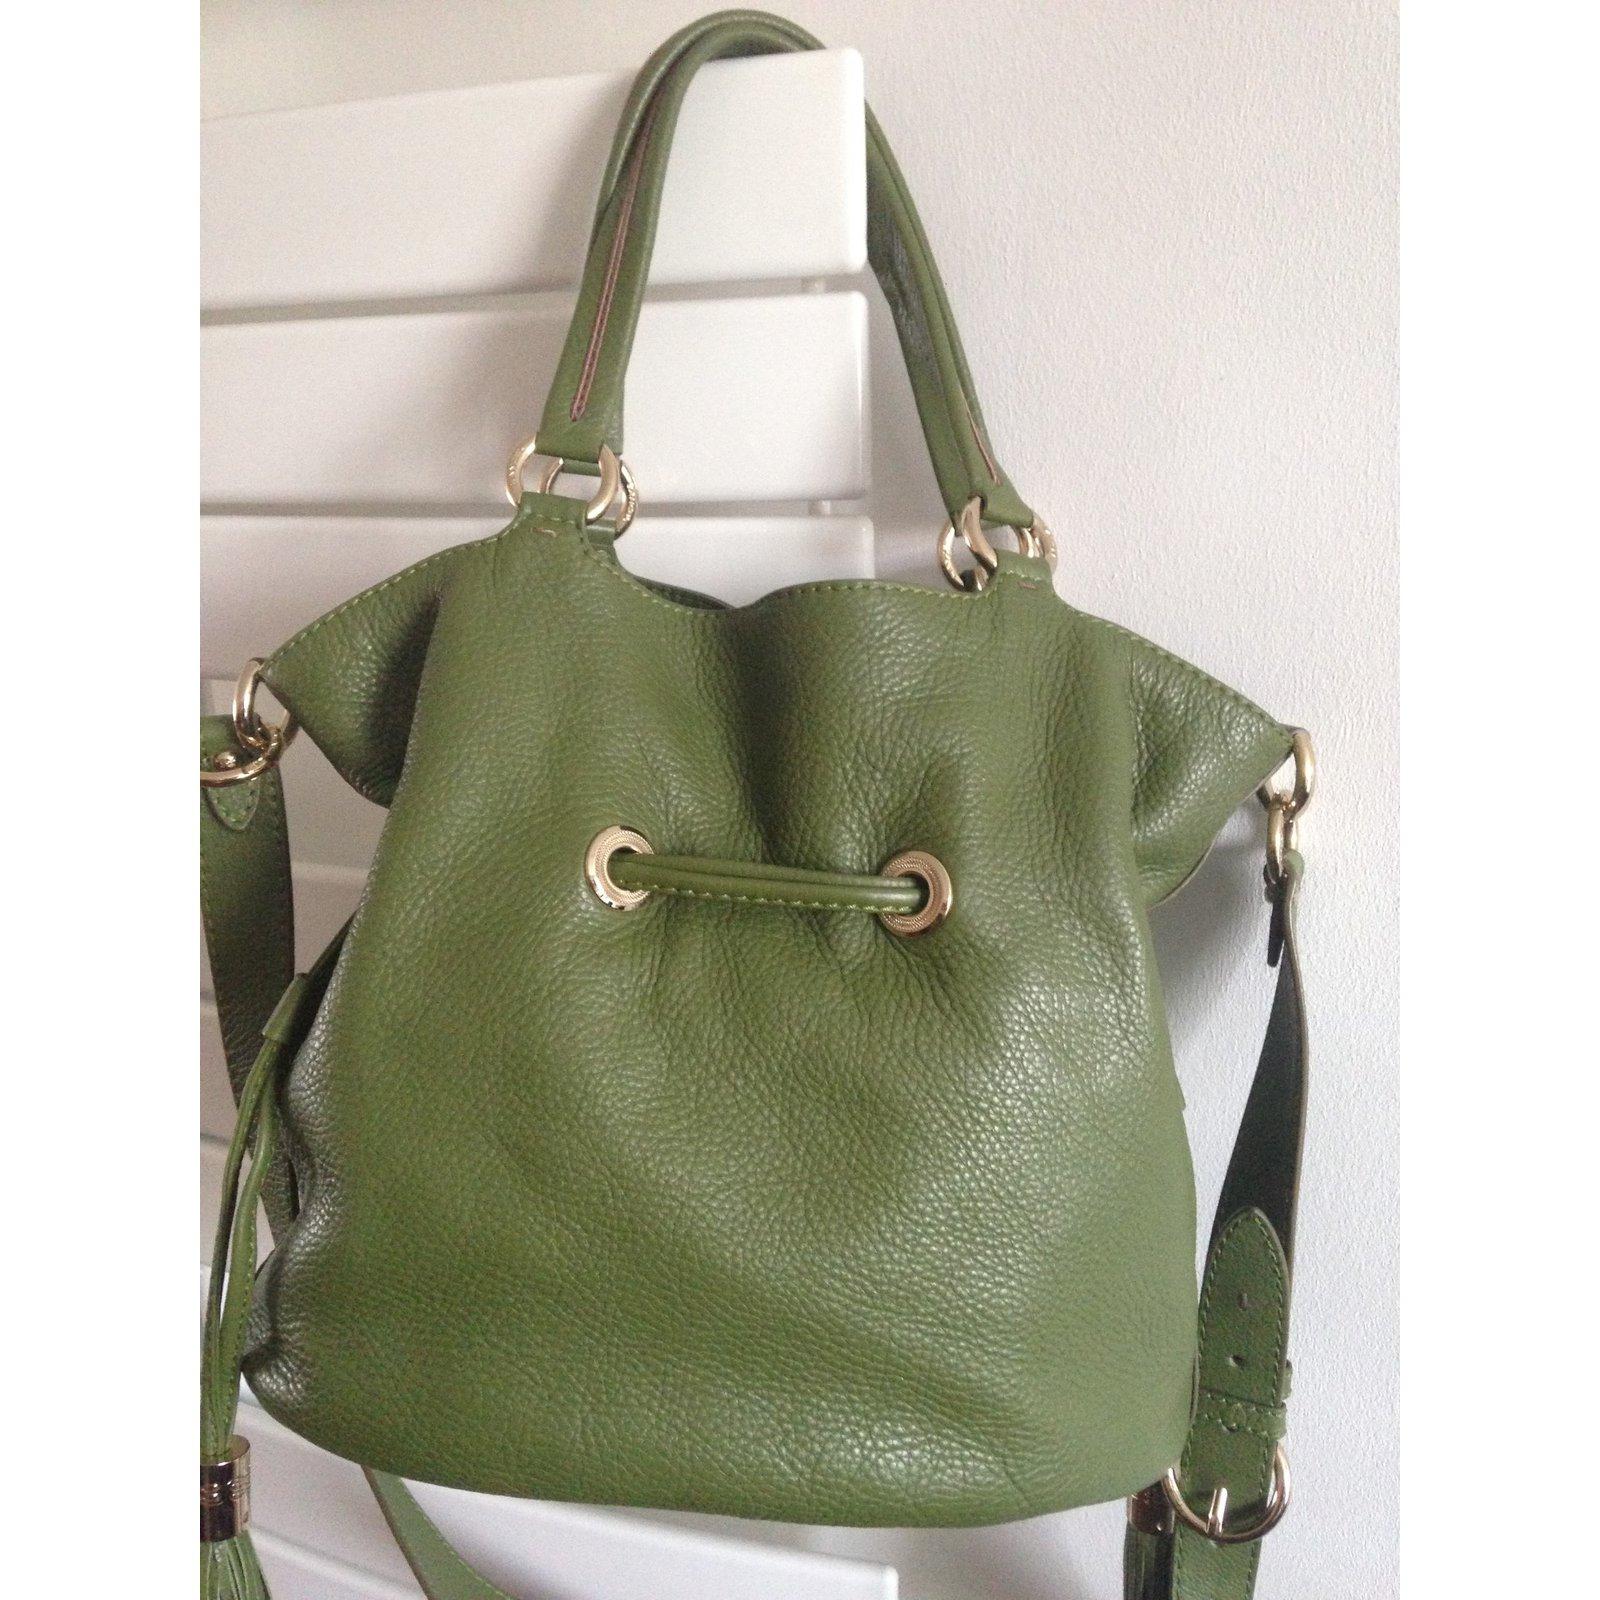 premier flirt vert aventurine [url= ]sac lancel premier flirt vert aventurine[/url].